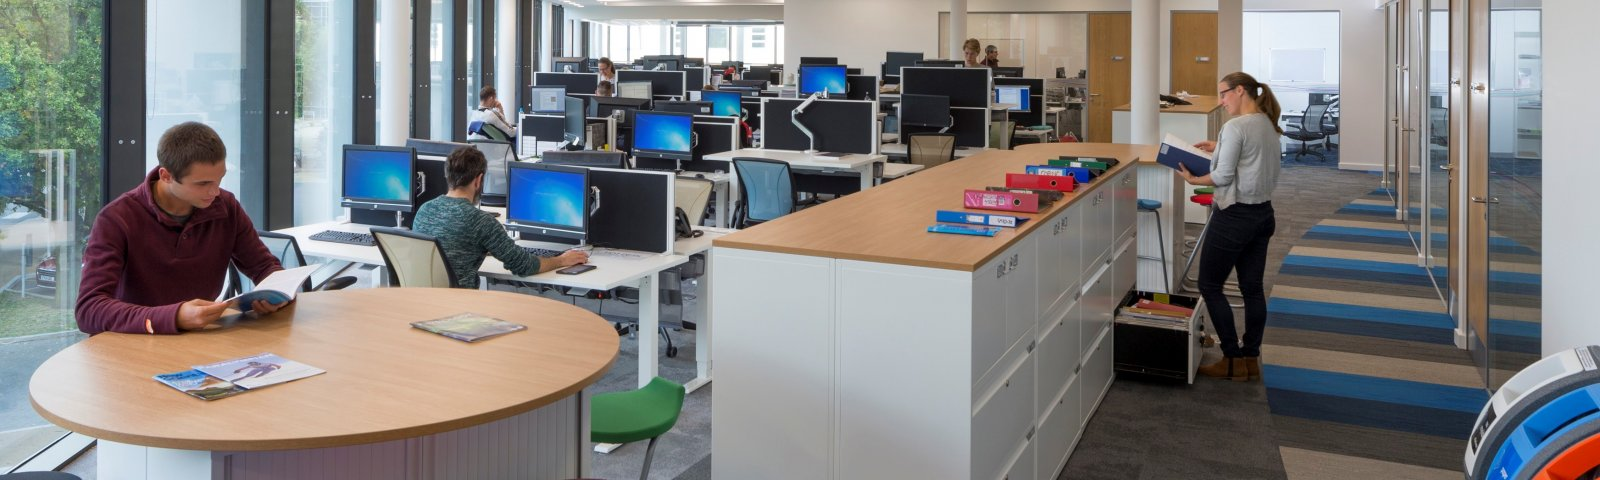 Lusep Office Photo